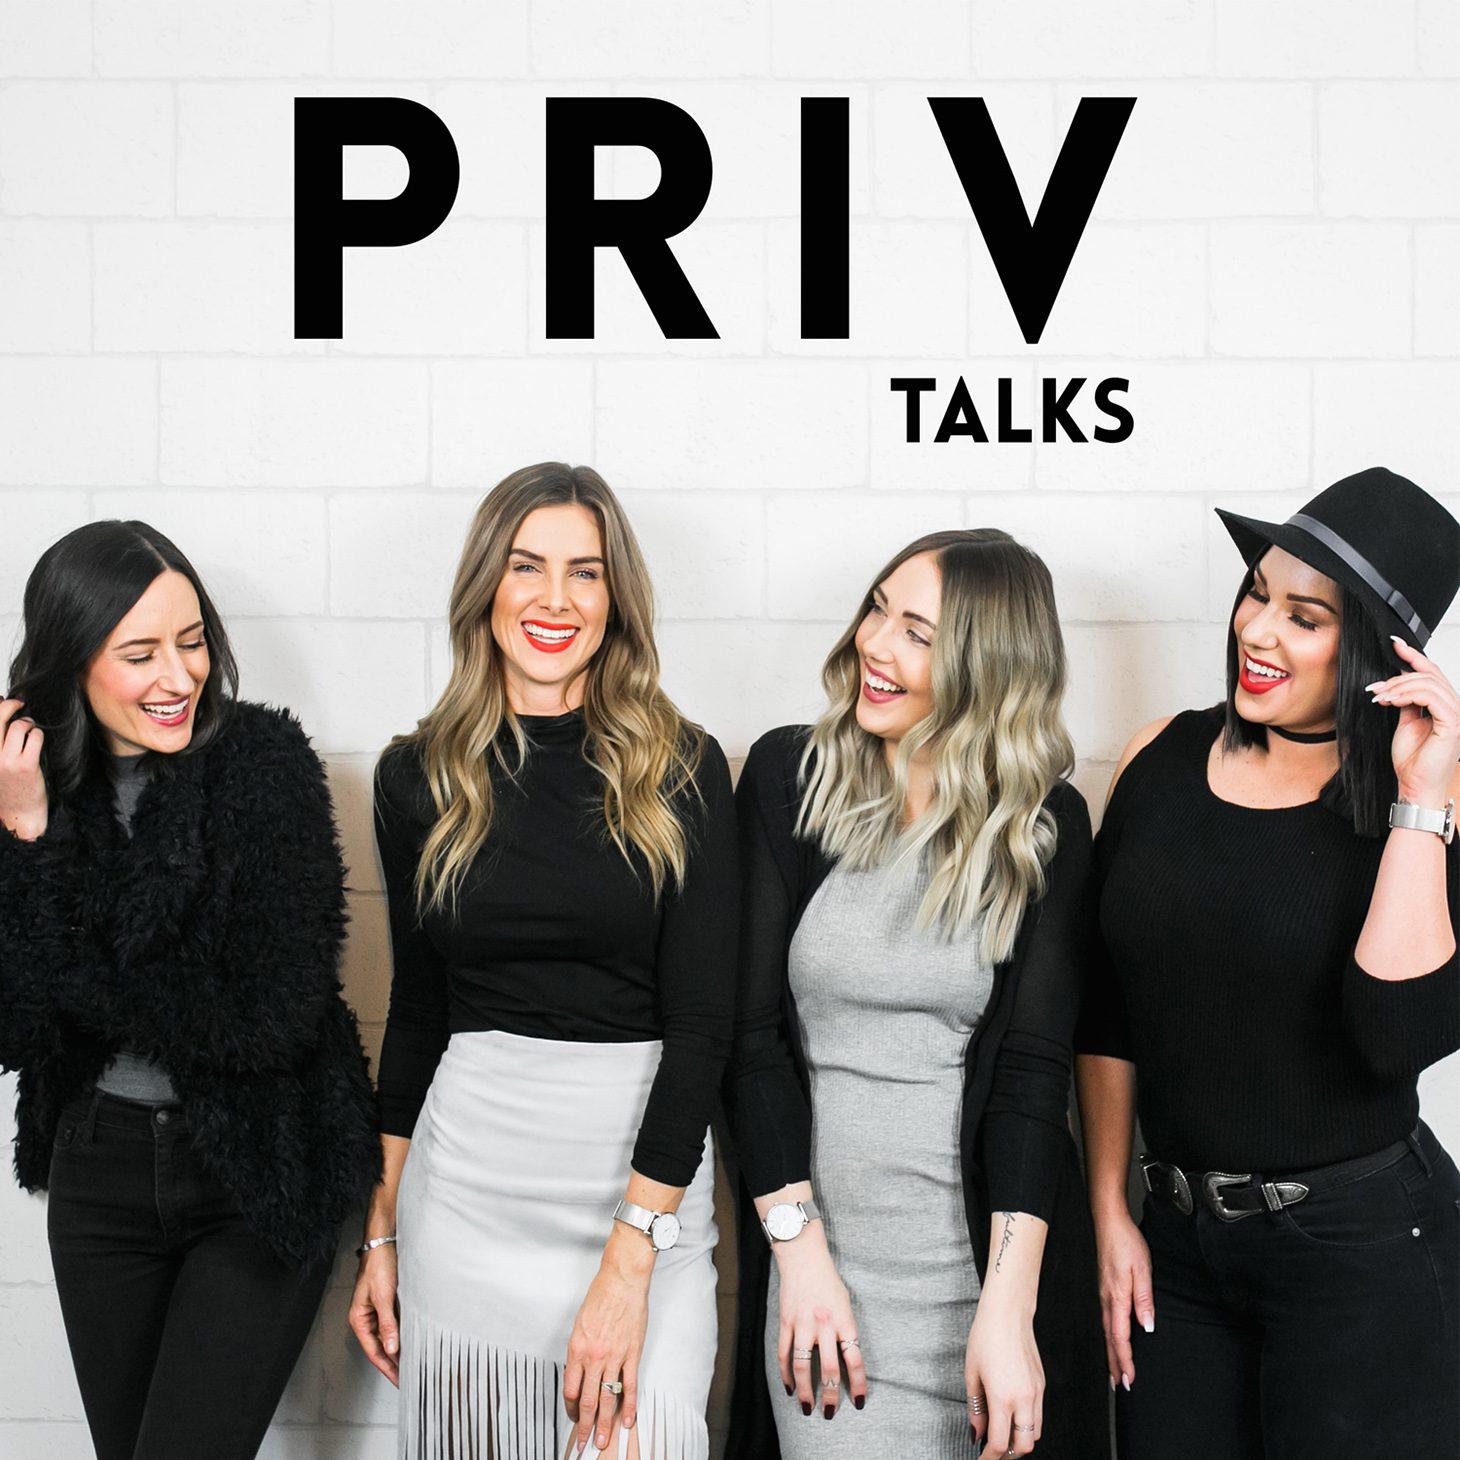 Priv Talks Podcast